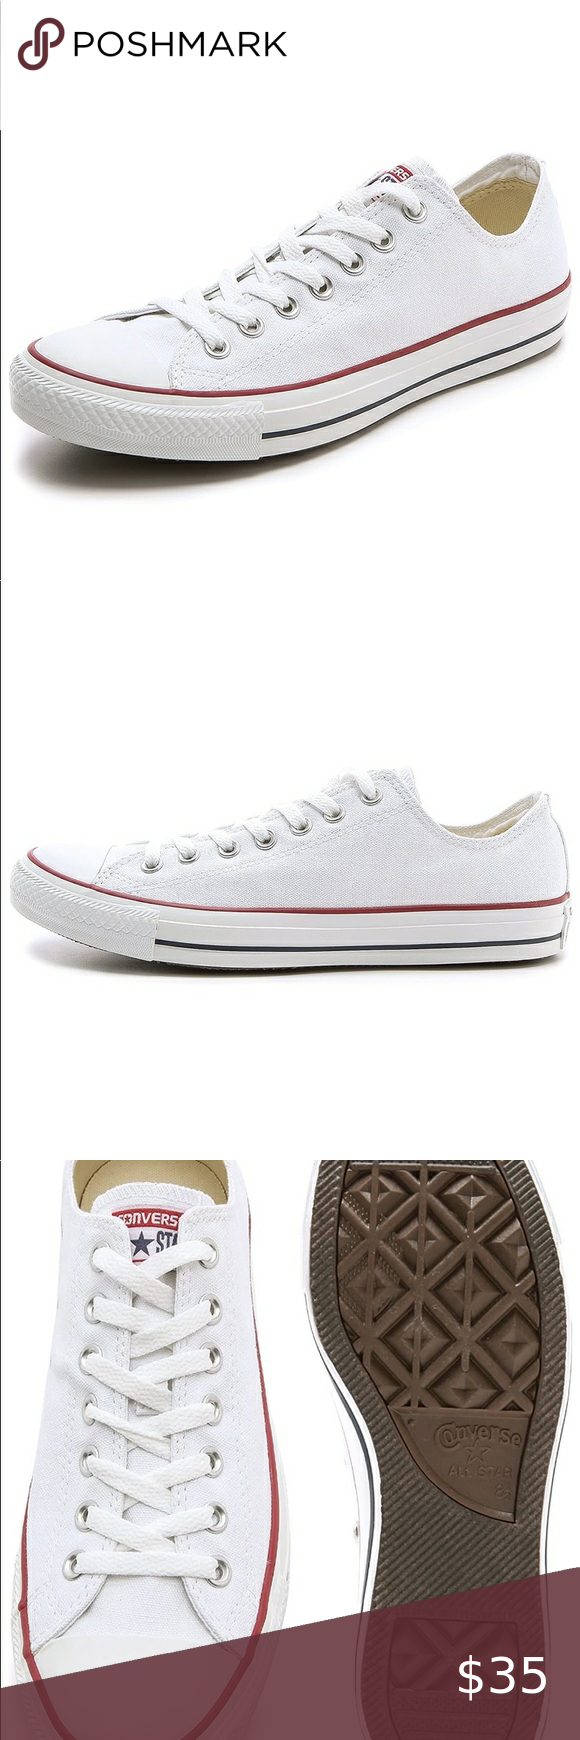 Size 10 White Converse Chuck Taylor Low